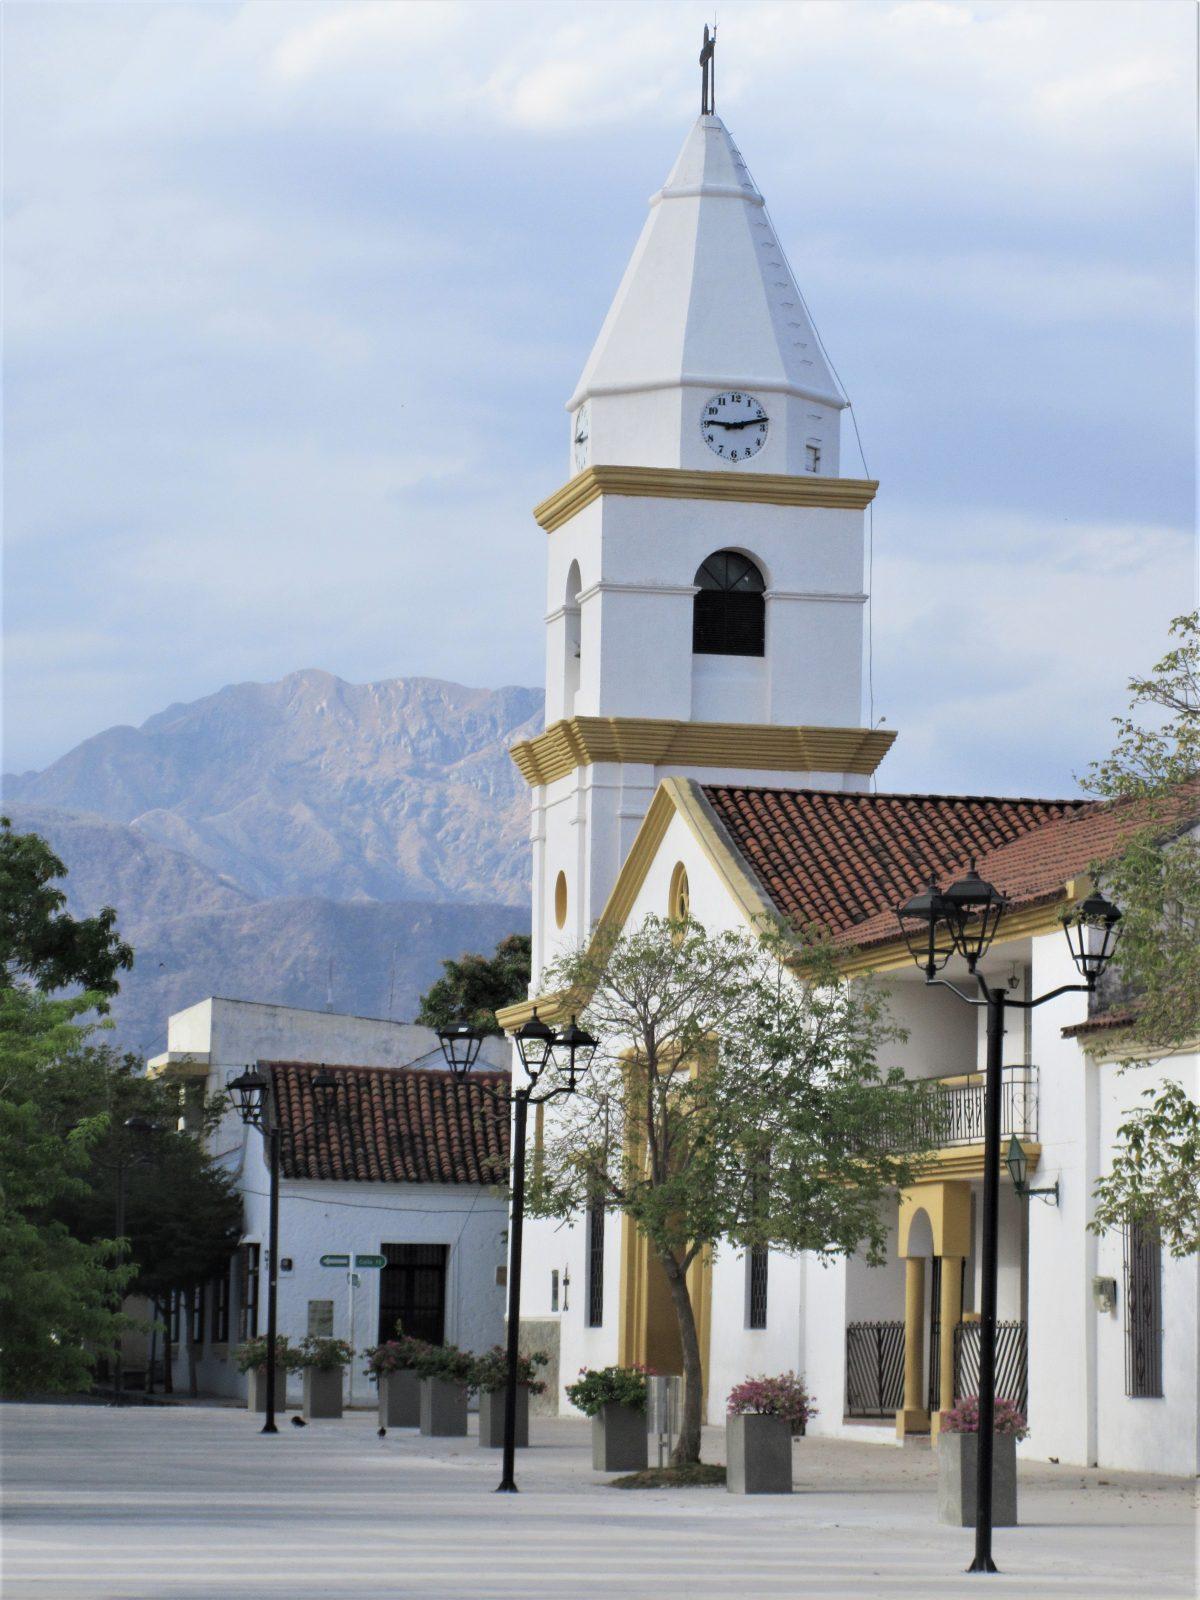 Valledupar – the Musical  Capital of Vallenato